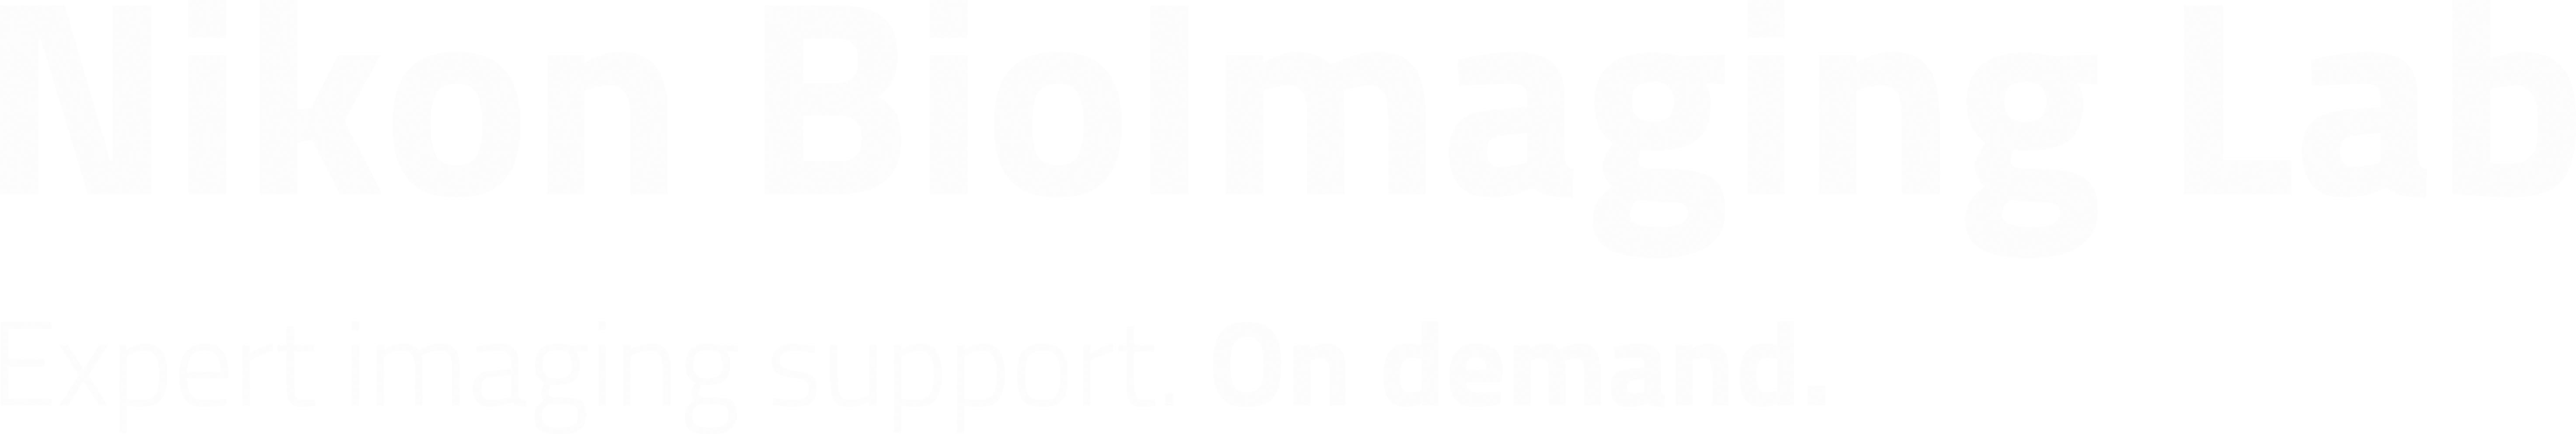 Nikon BioImaging Lab